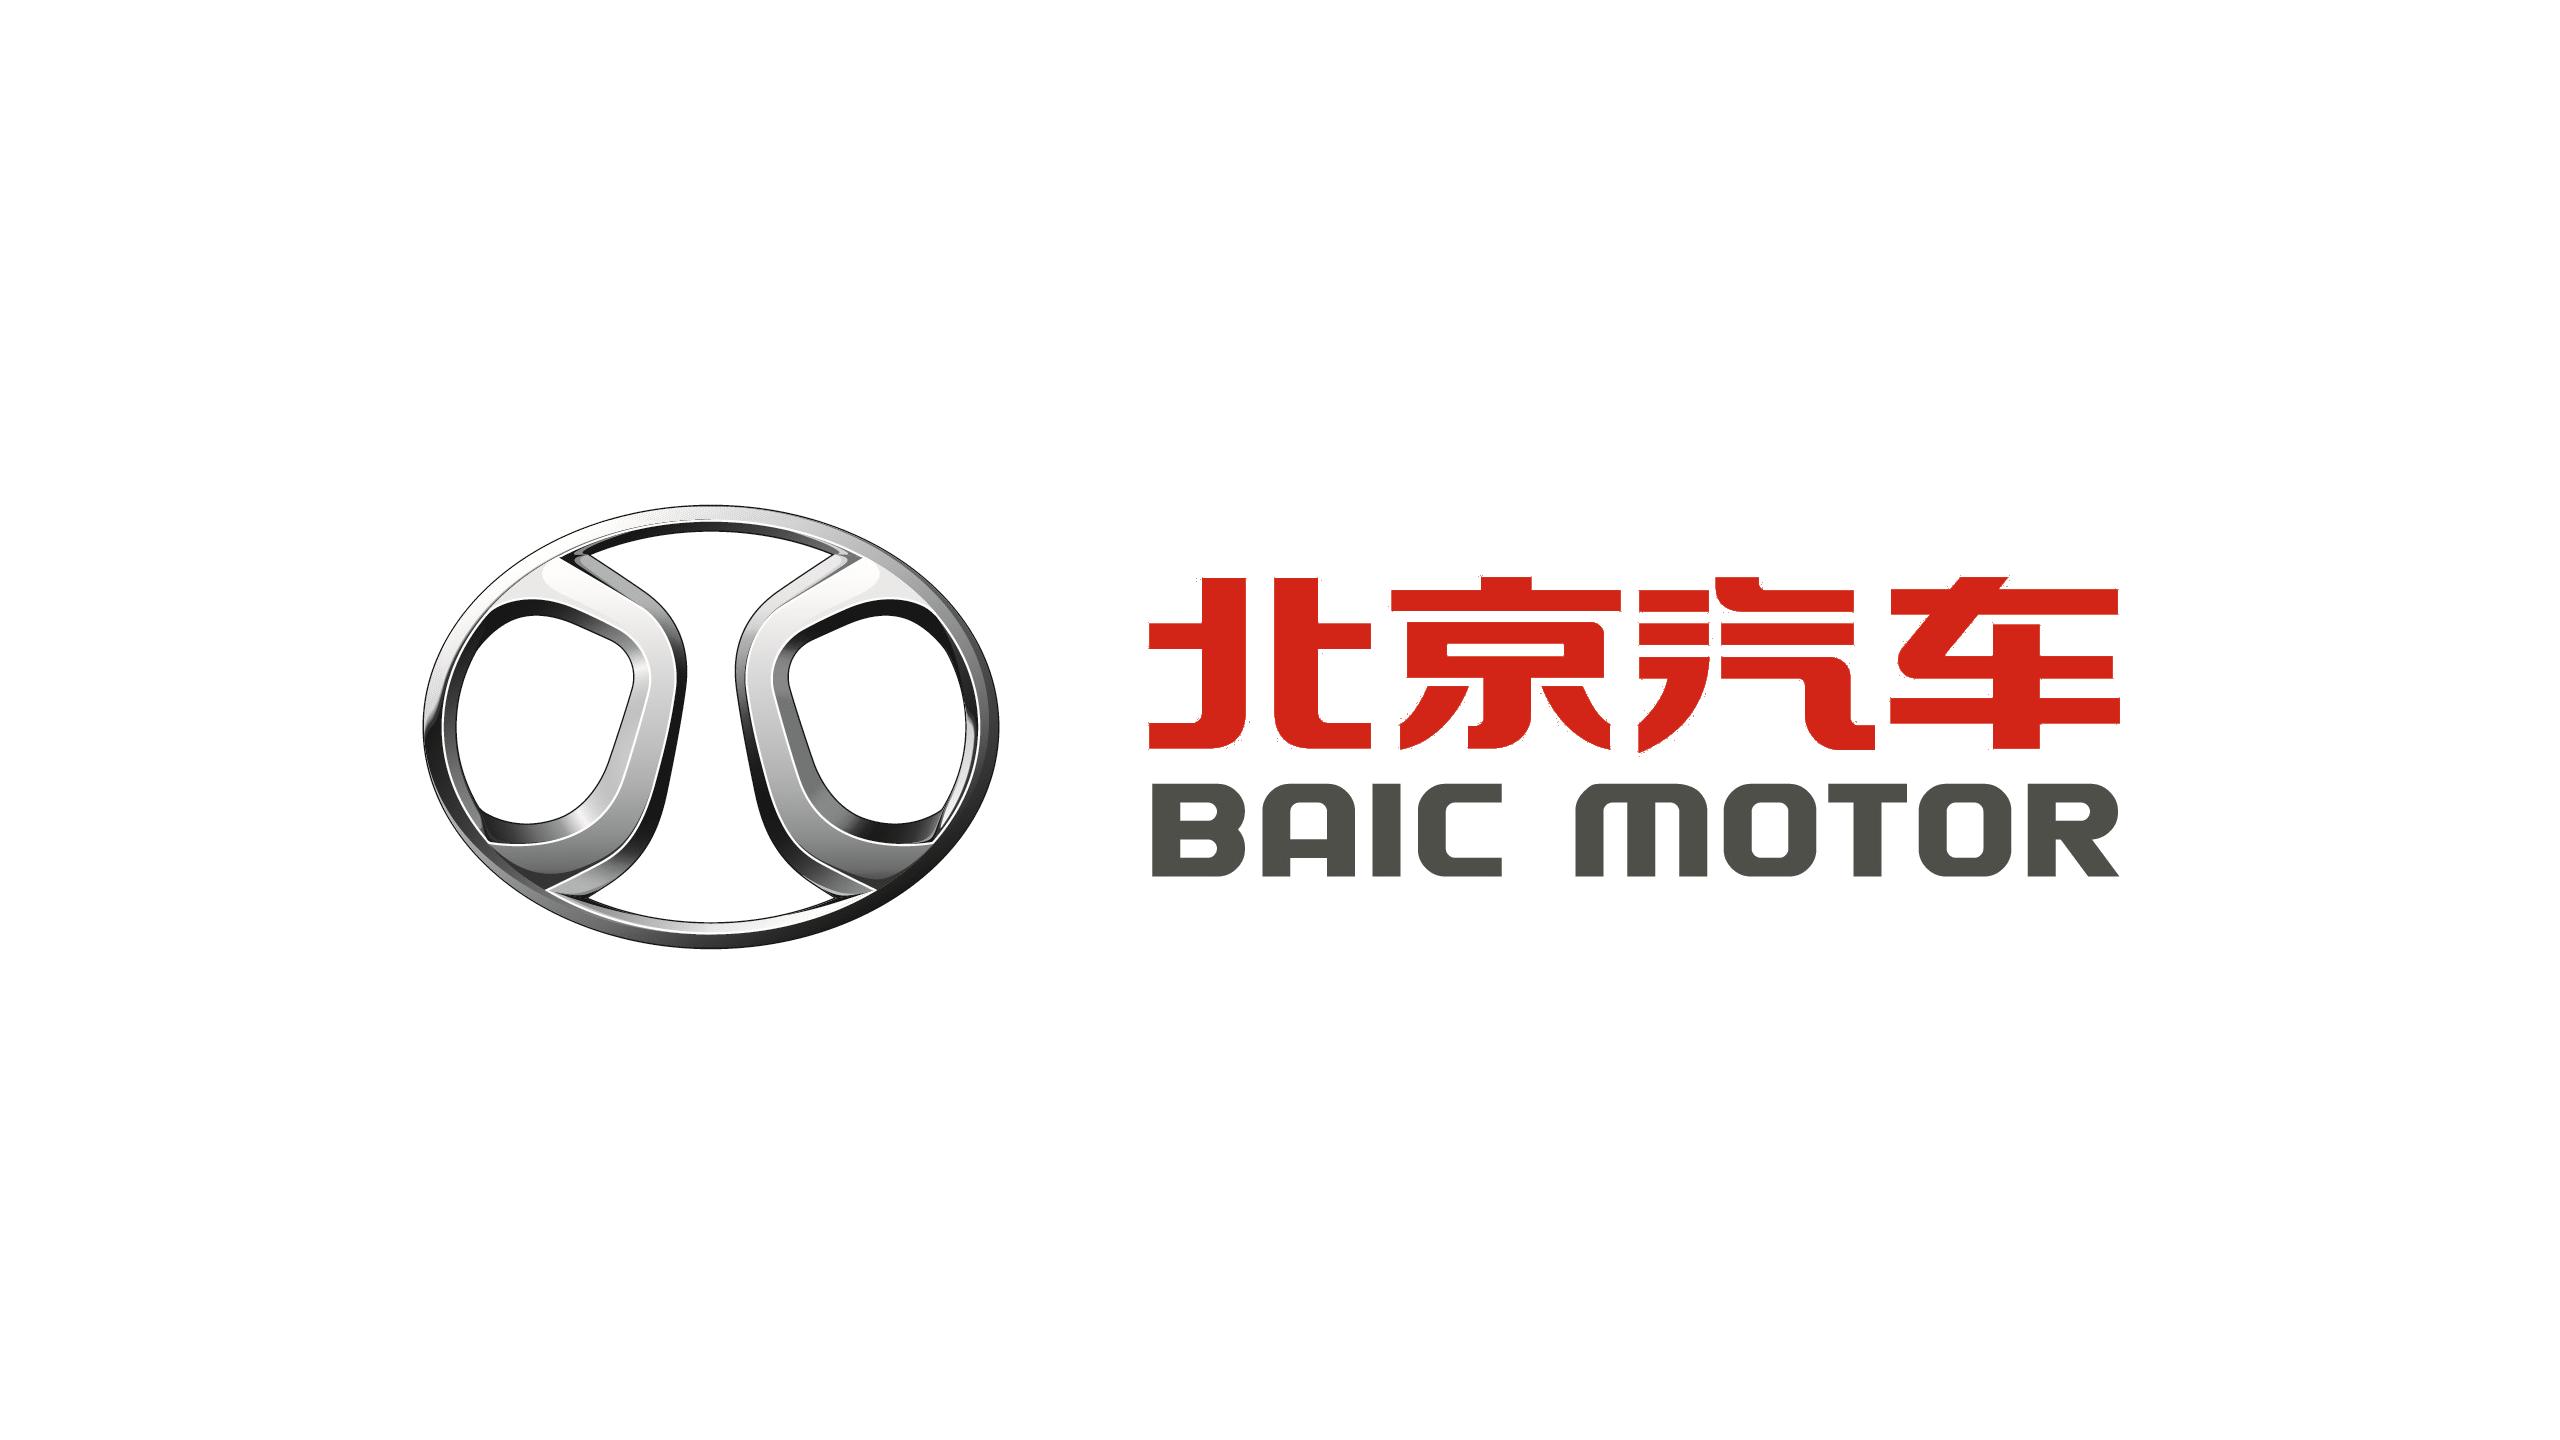 BAIC-Motor-logo-2560x1440